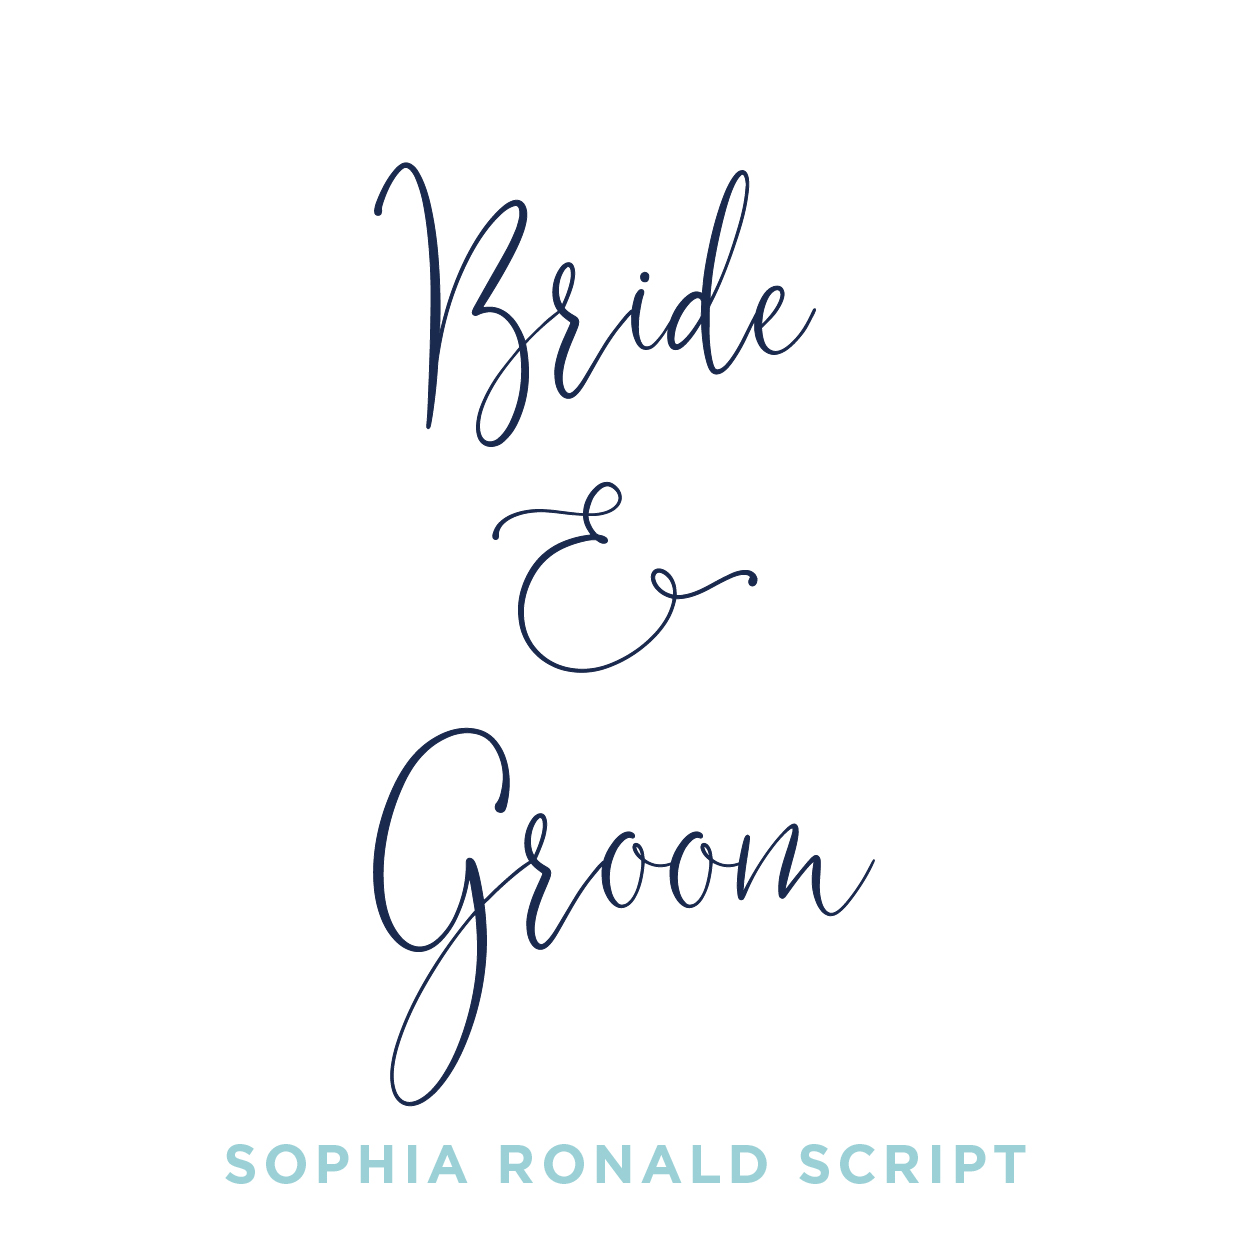 Sophia Ronald.jpg